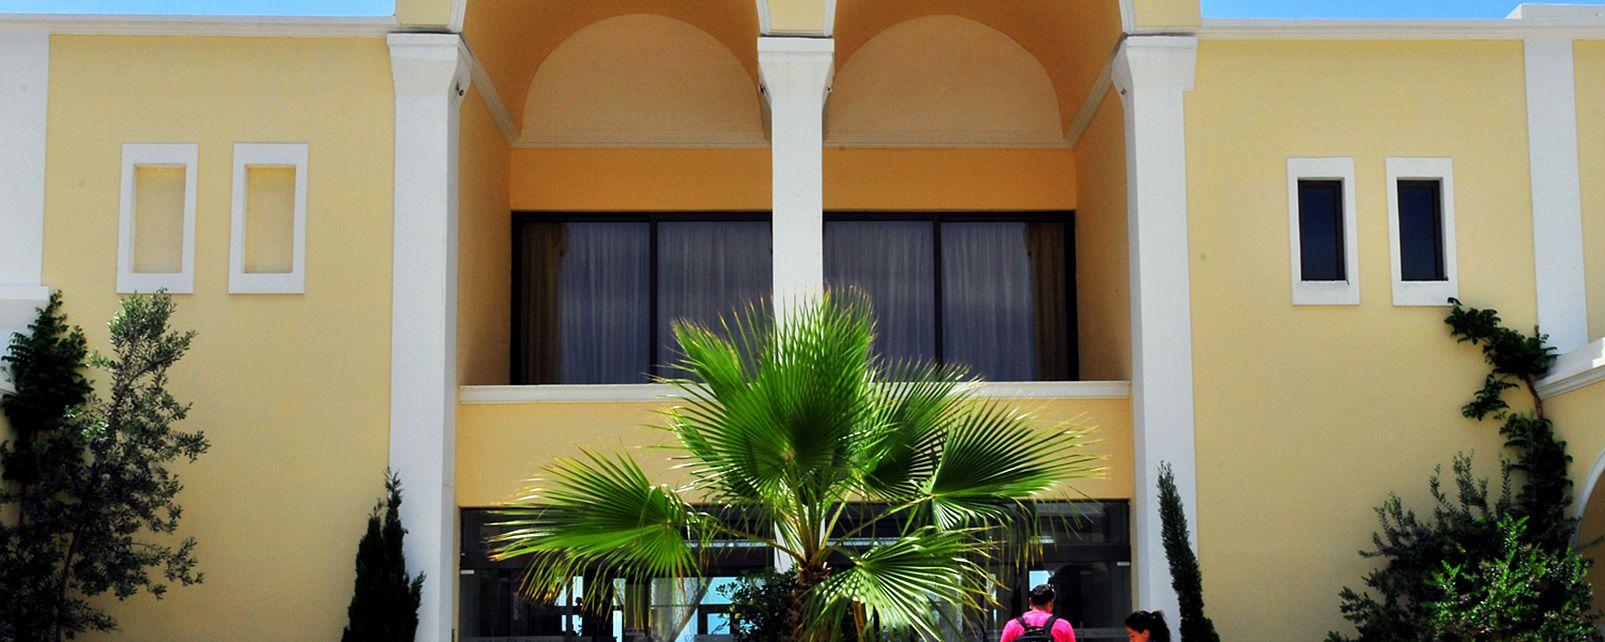 Hotel Seaclub Porto Bello Royal